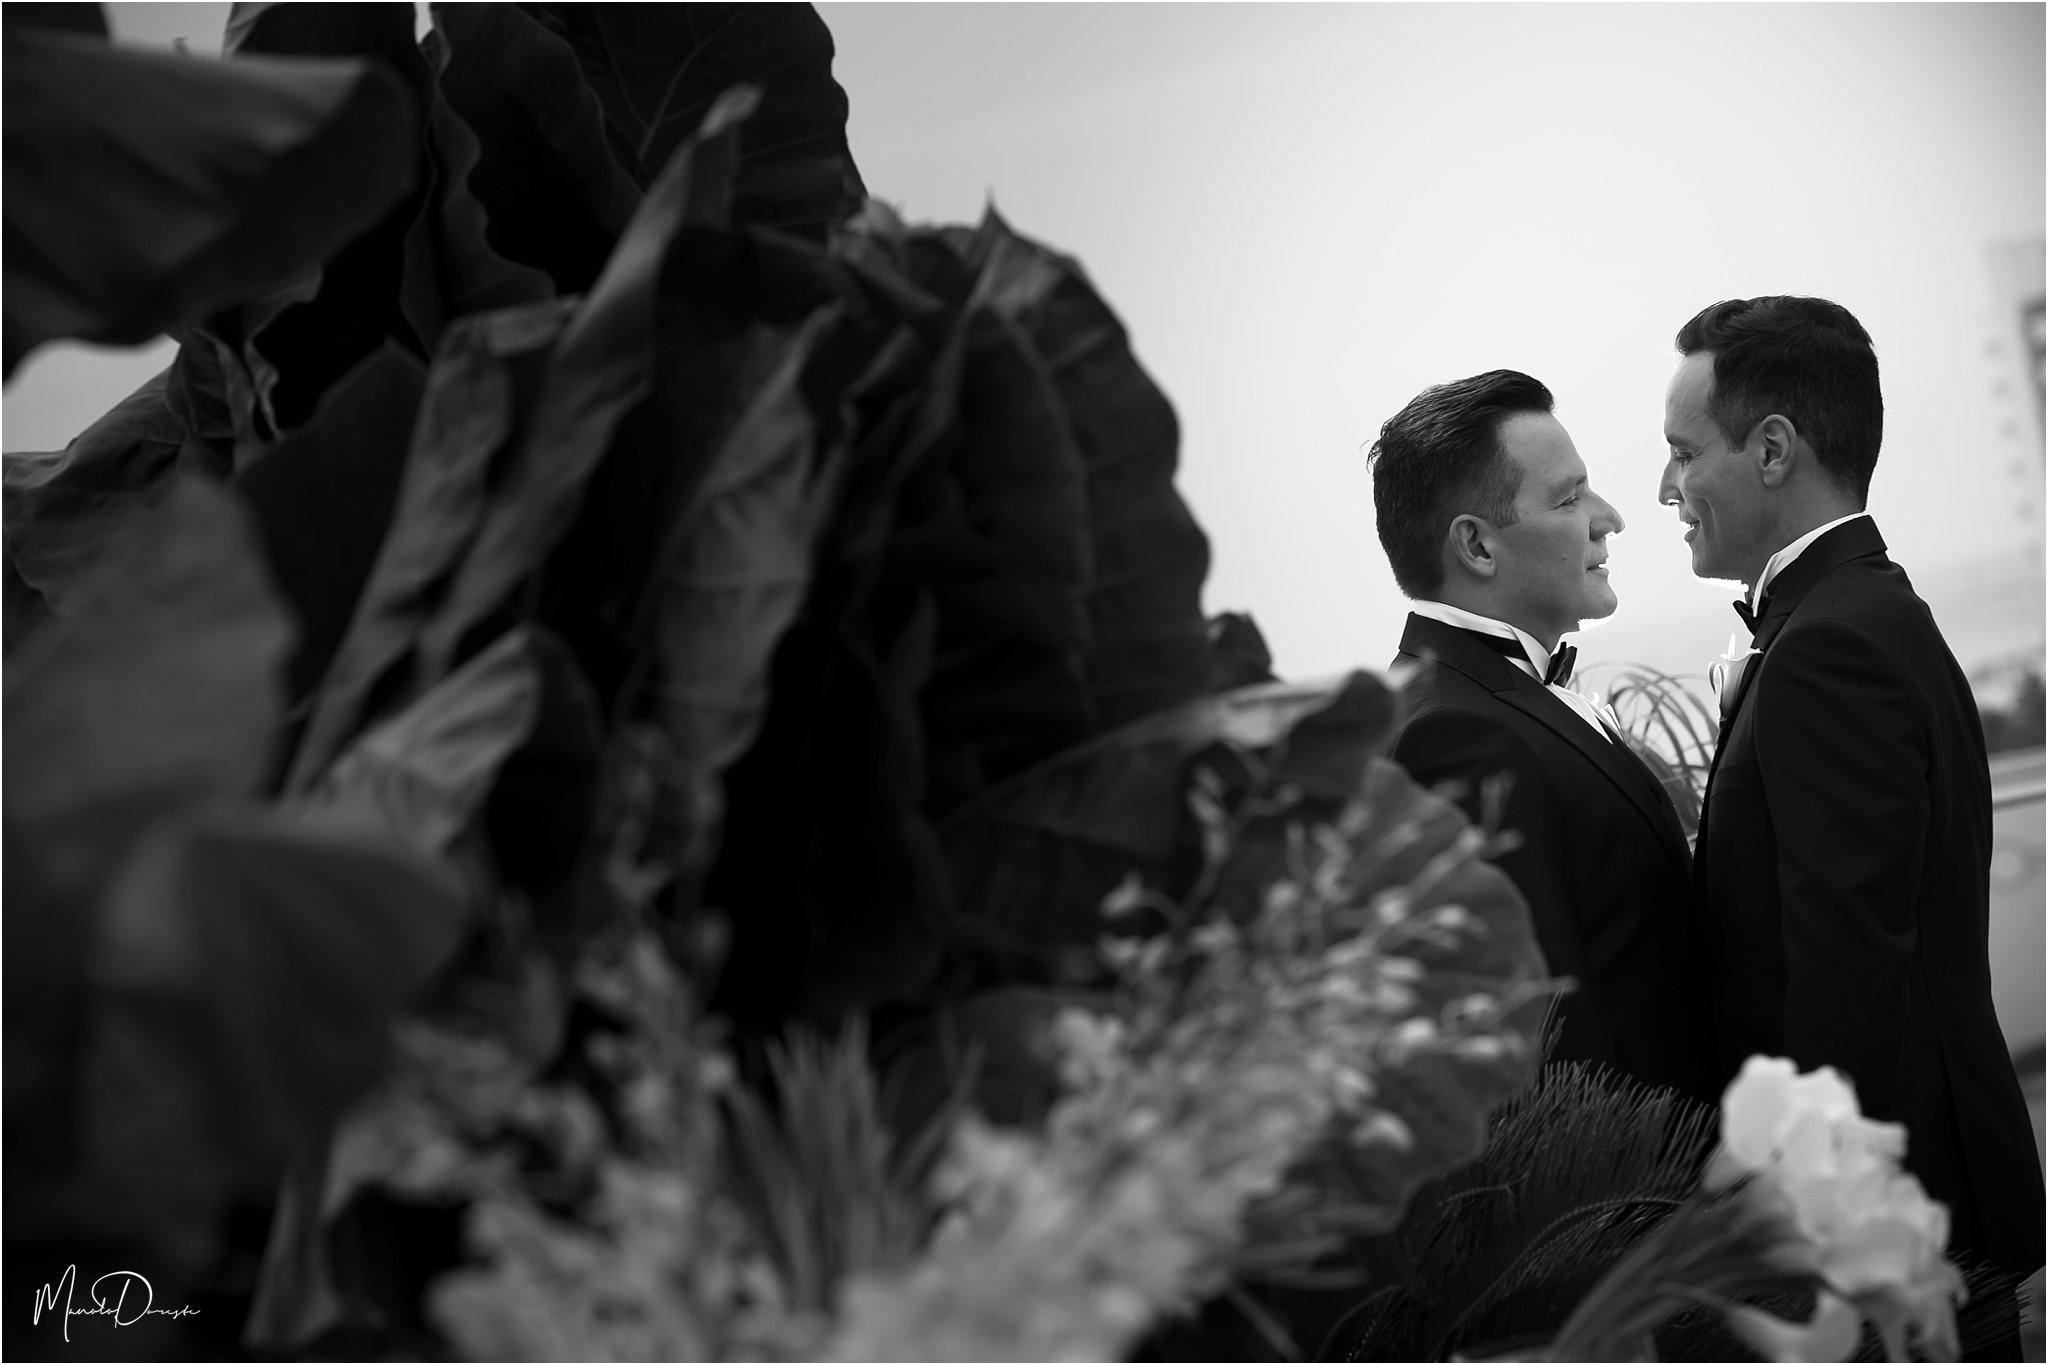 0187_ManoloDoreste_InFocusStudios_Wedding_Family_Photography_Miami_MiamiPhotographer.jpg